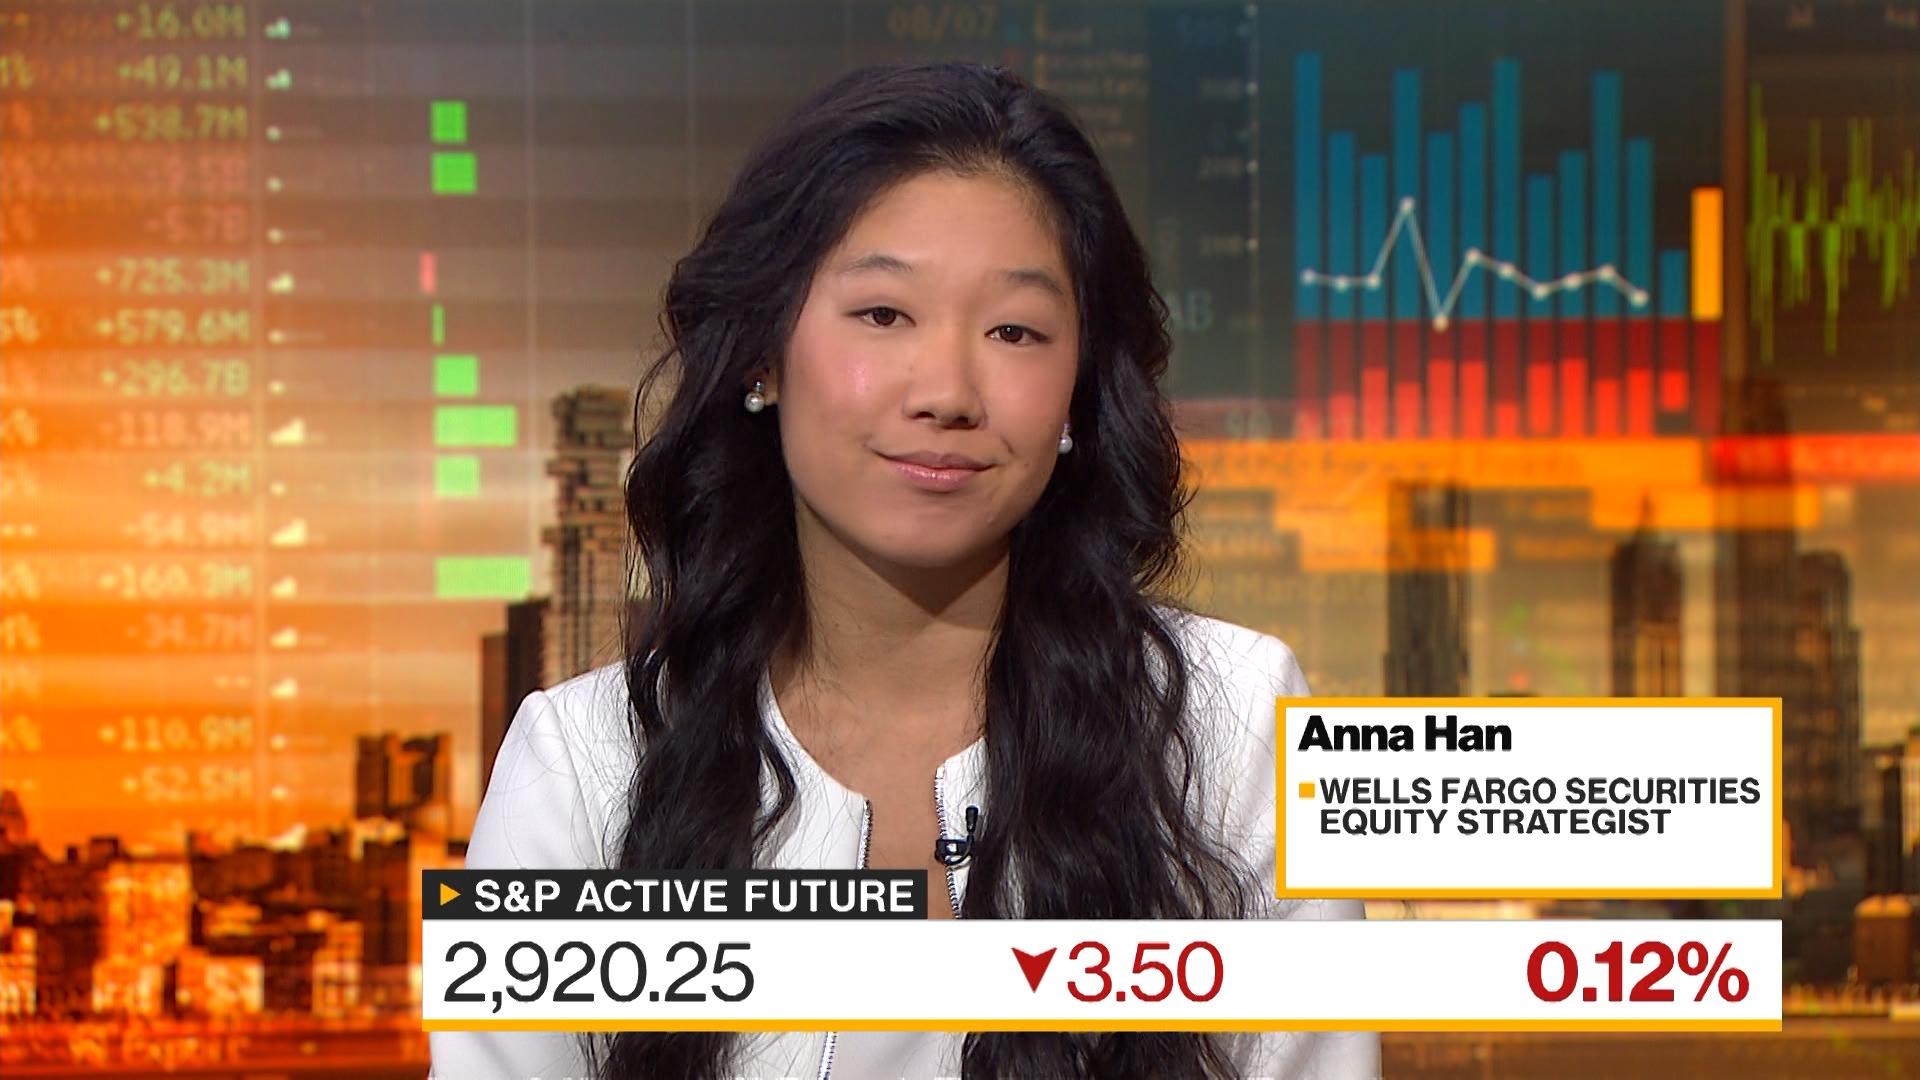 Anna Han, Strategist at Wells Fargo Securities, on U.S. stocks, Fed